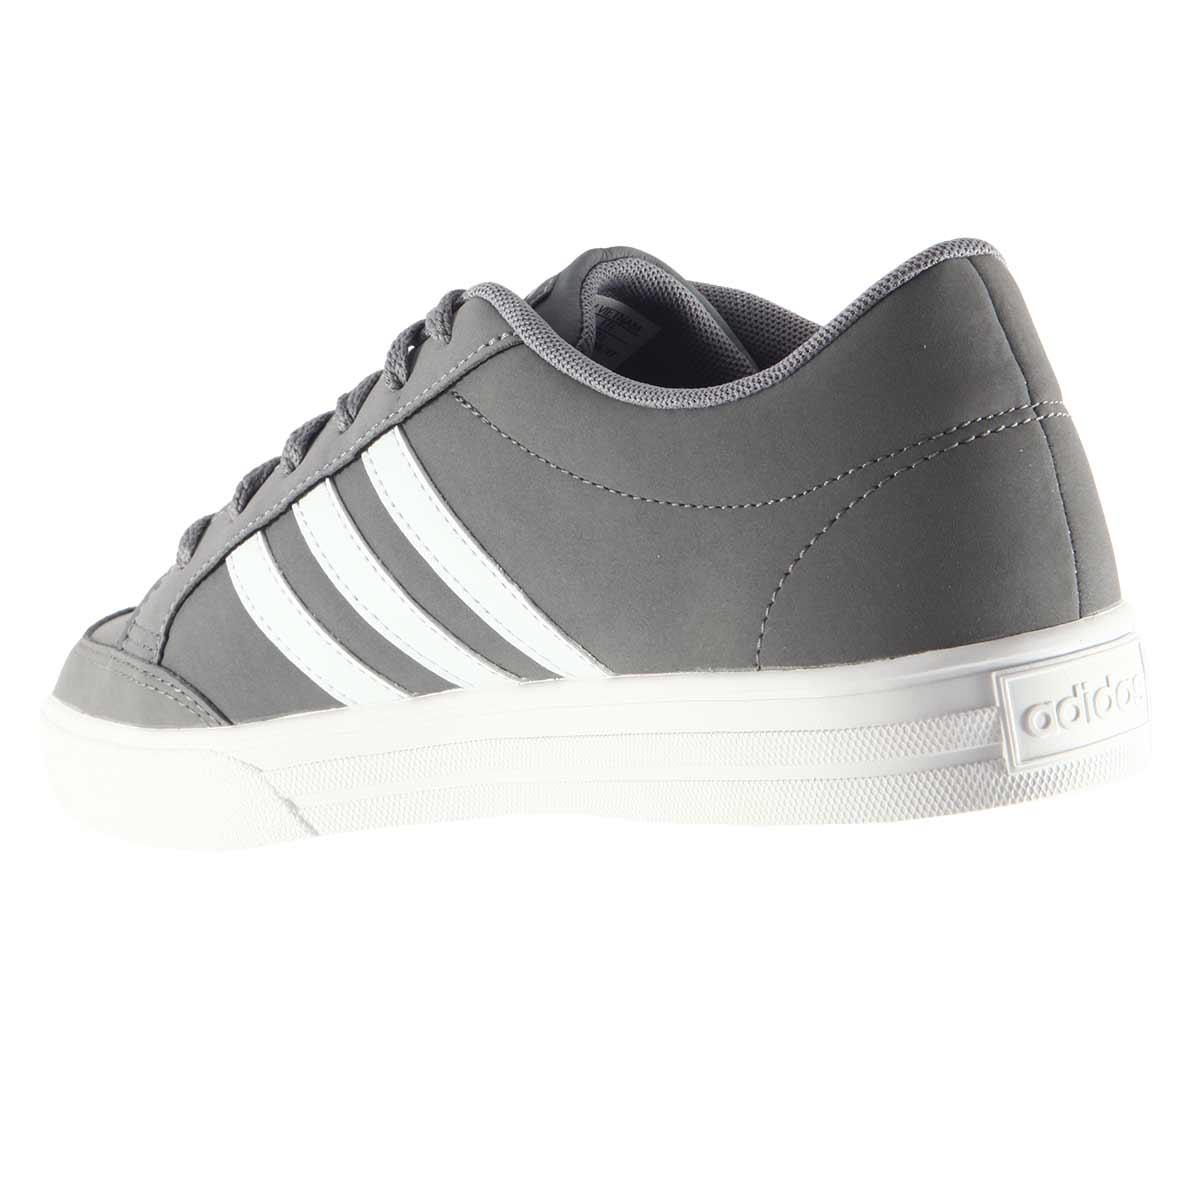 Tênis Adidas VS Set Casual Retrô BB9672  - Ian Calçados